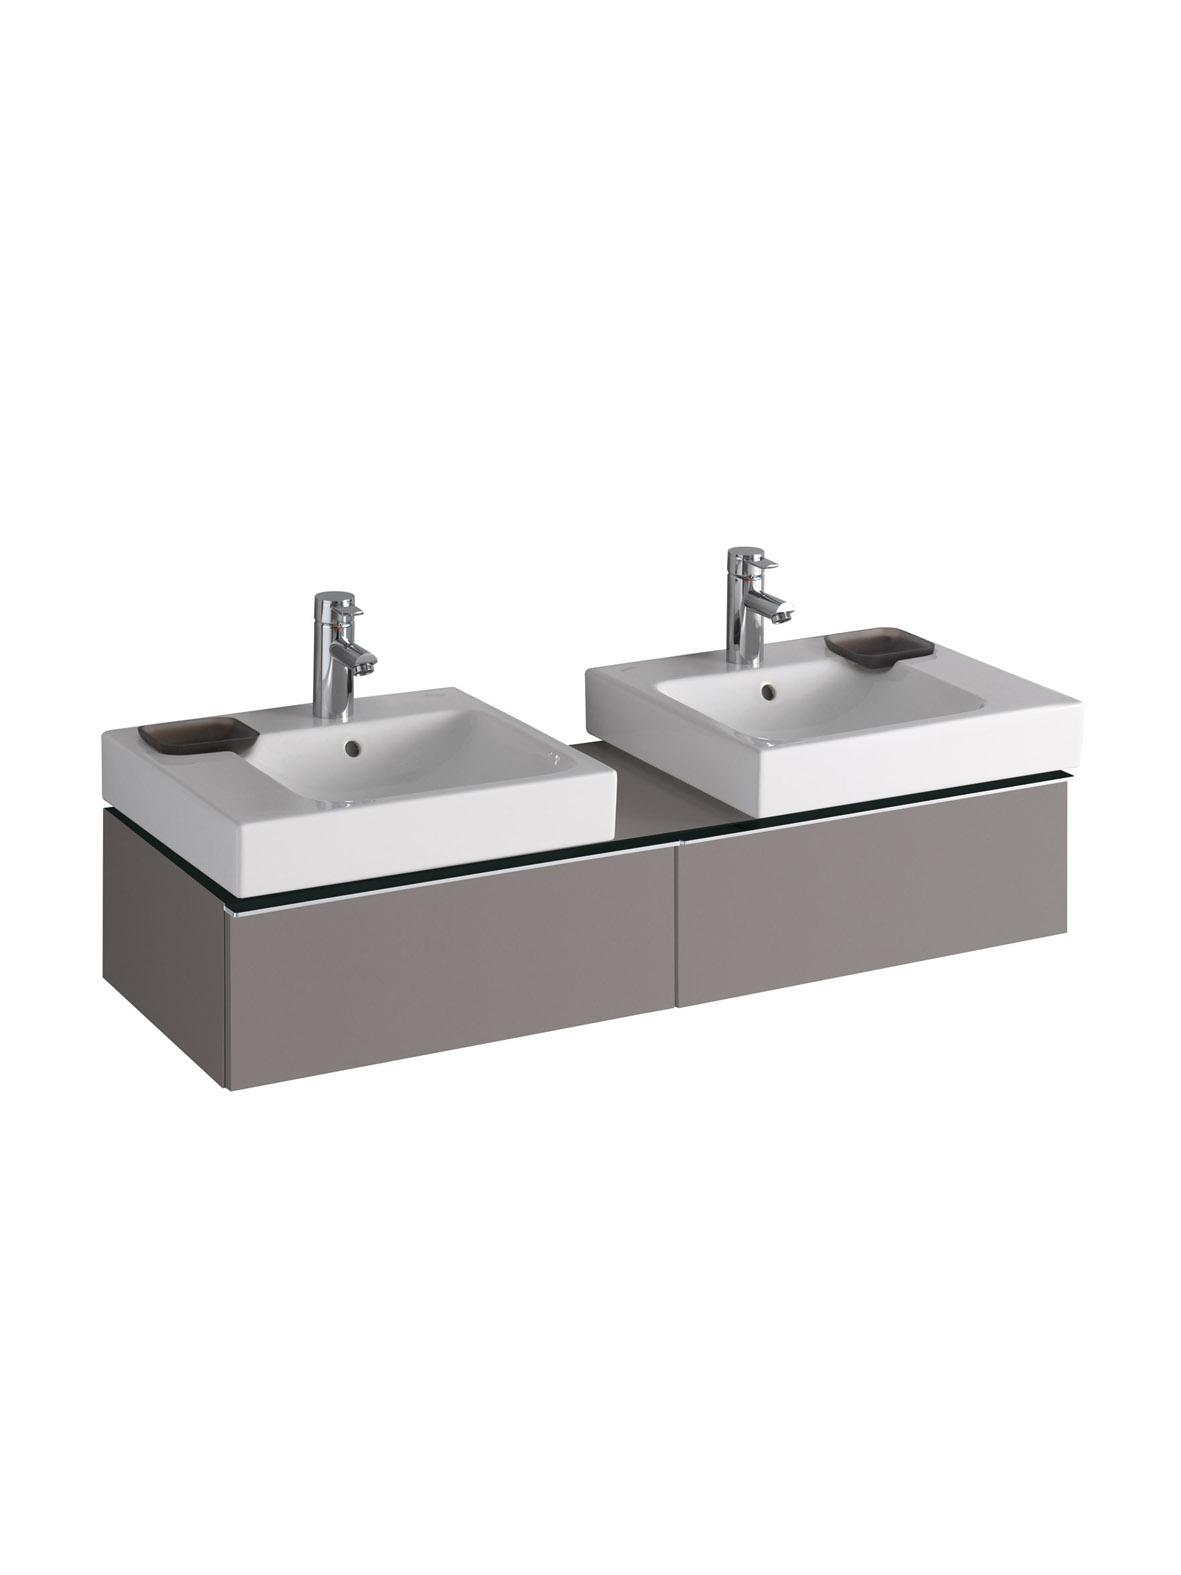 koupelnový nábytek KERAMAG Icon levá+pravá platinum